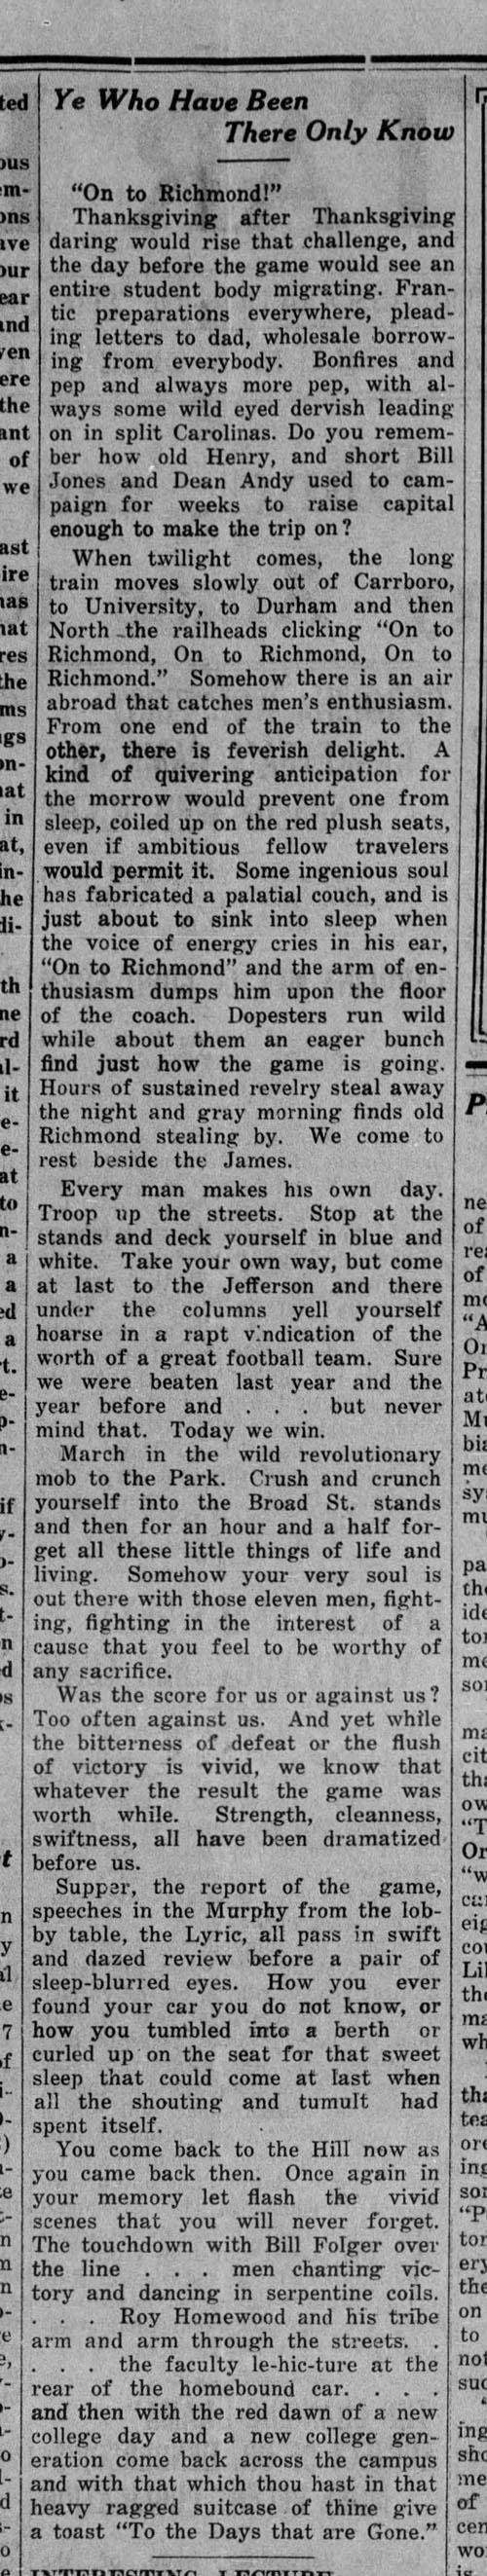 The_Daily_Tar_Heel_Sat__Dec_13__1919_